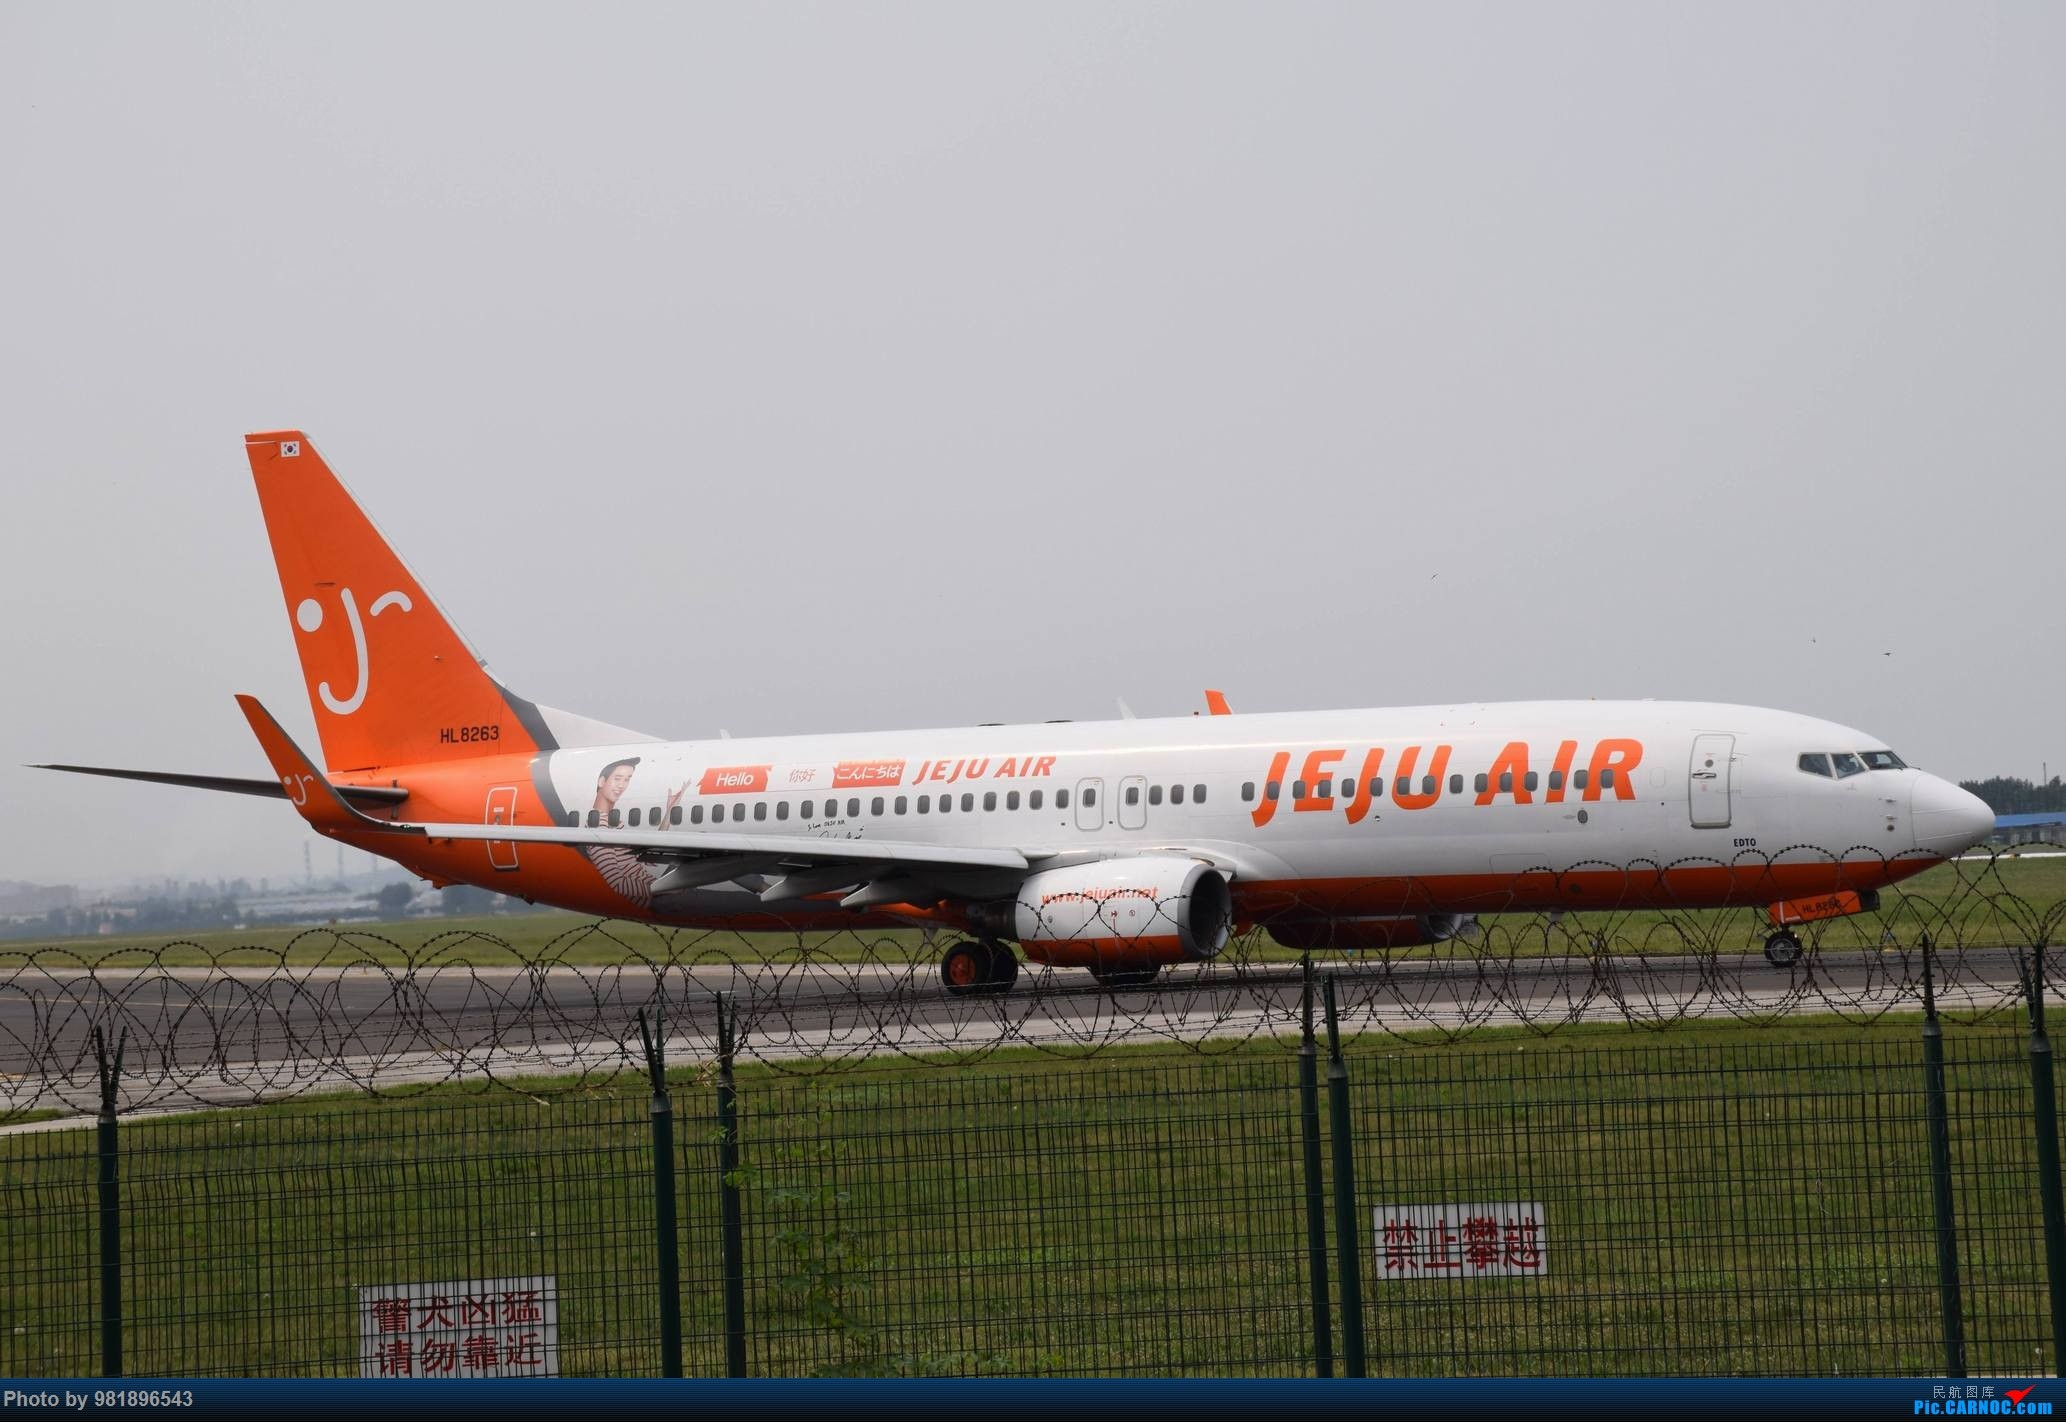 Re:[原创]【新人拍机】青岛周日的一天 BOEING 737-800 HL8263 中国青岛流亭国际机场